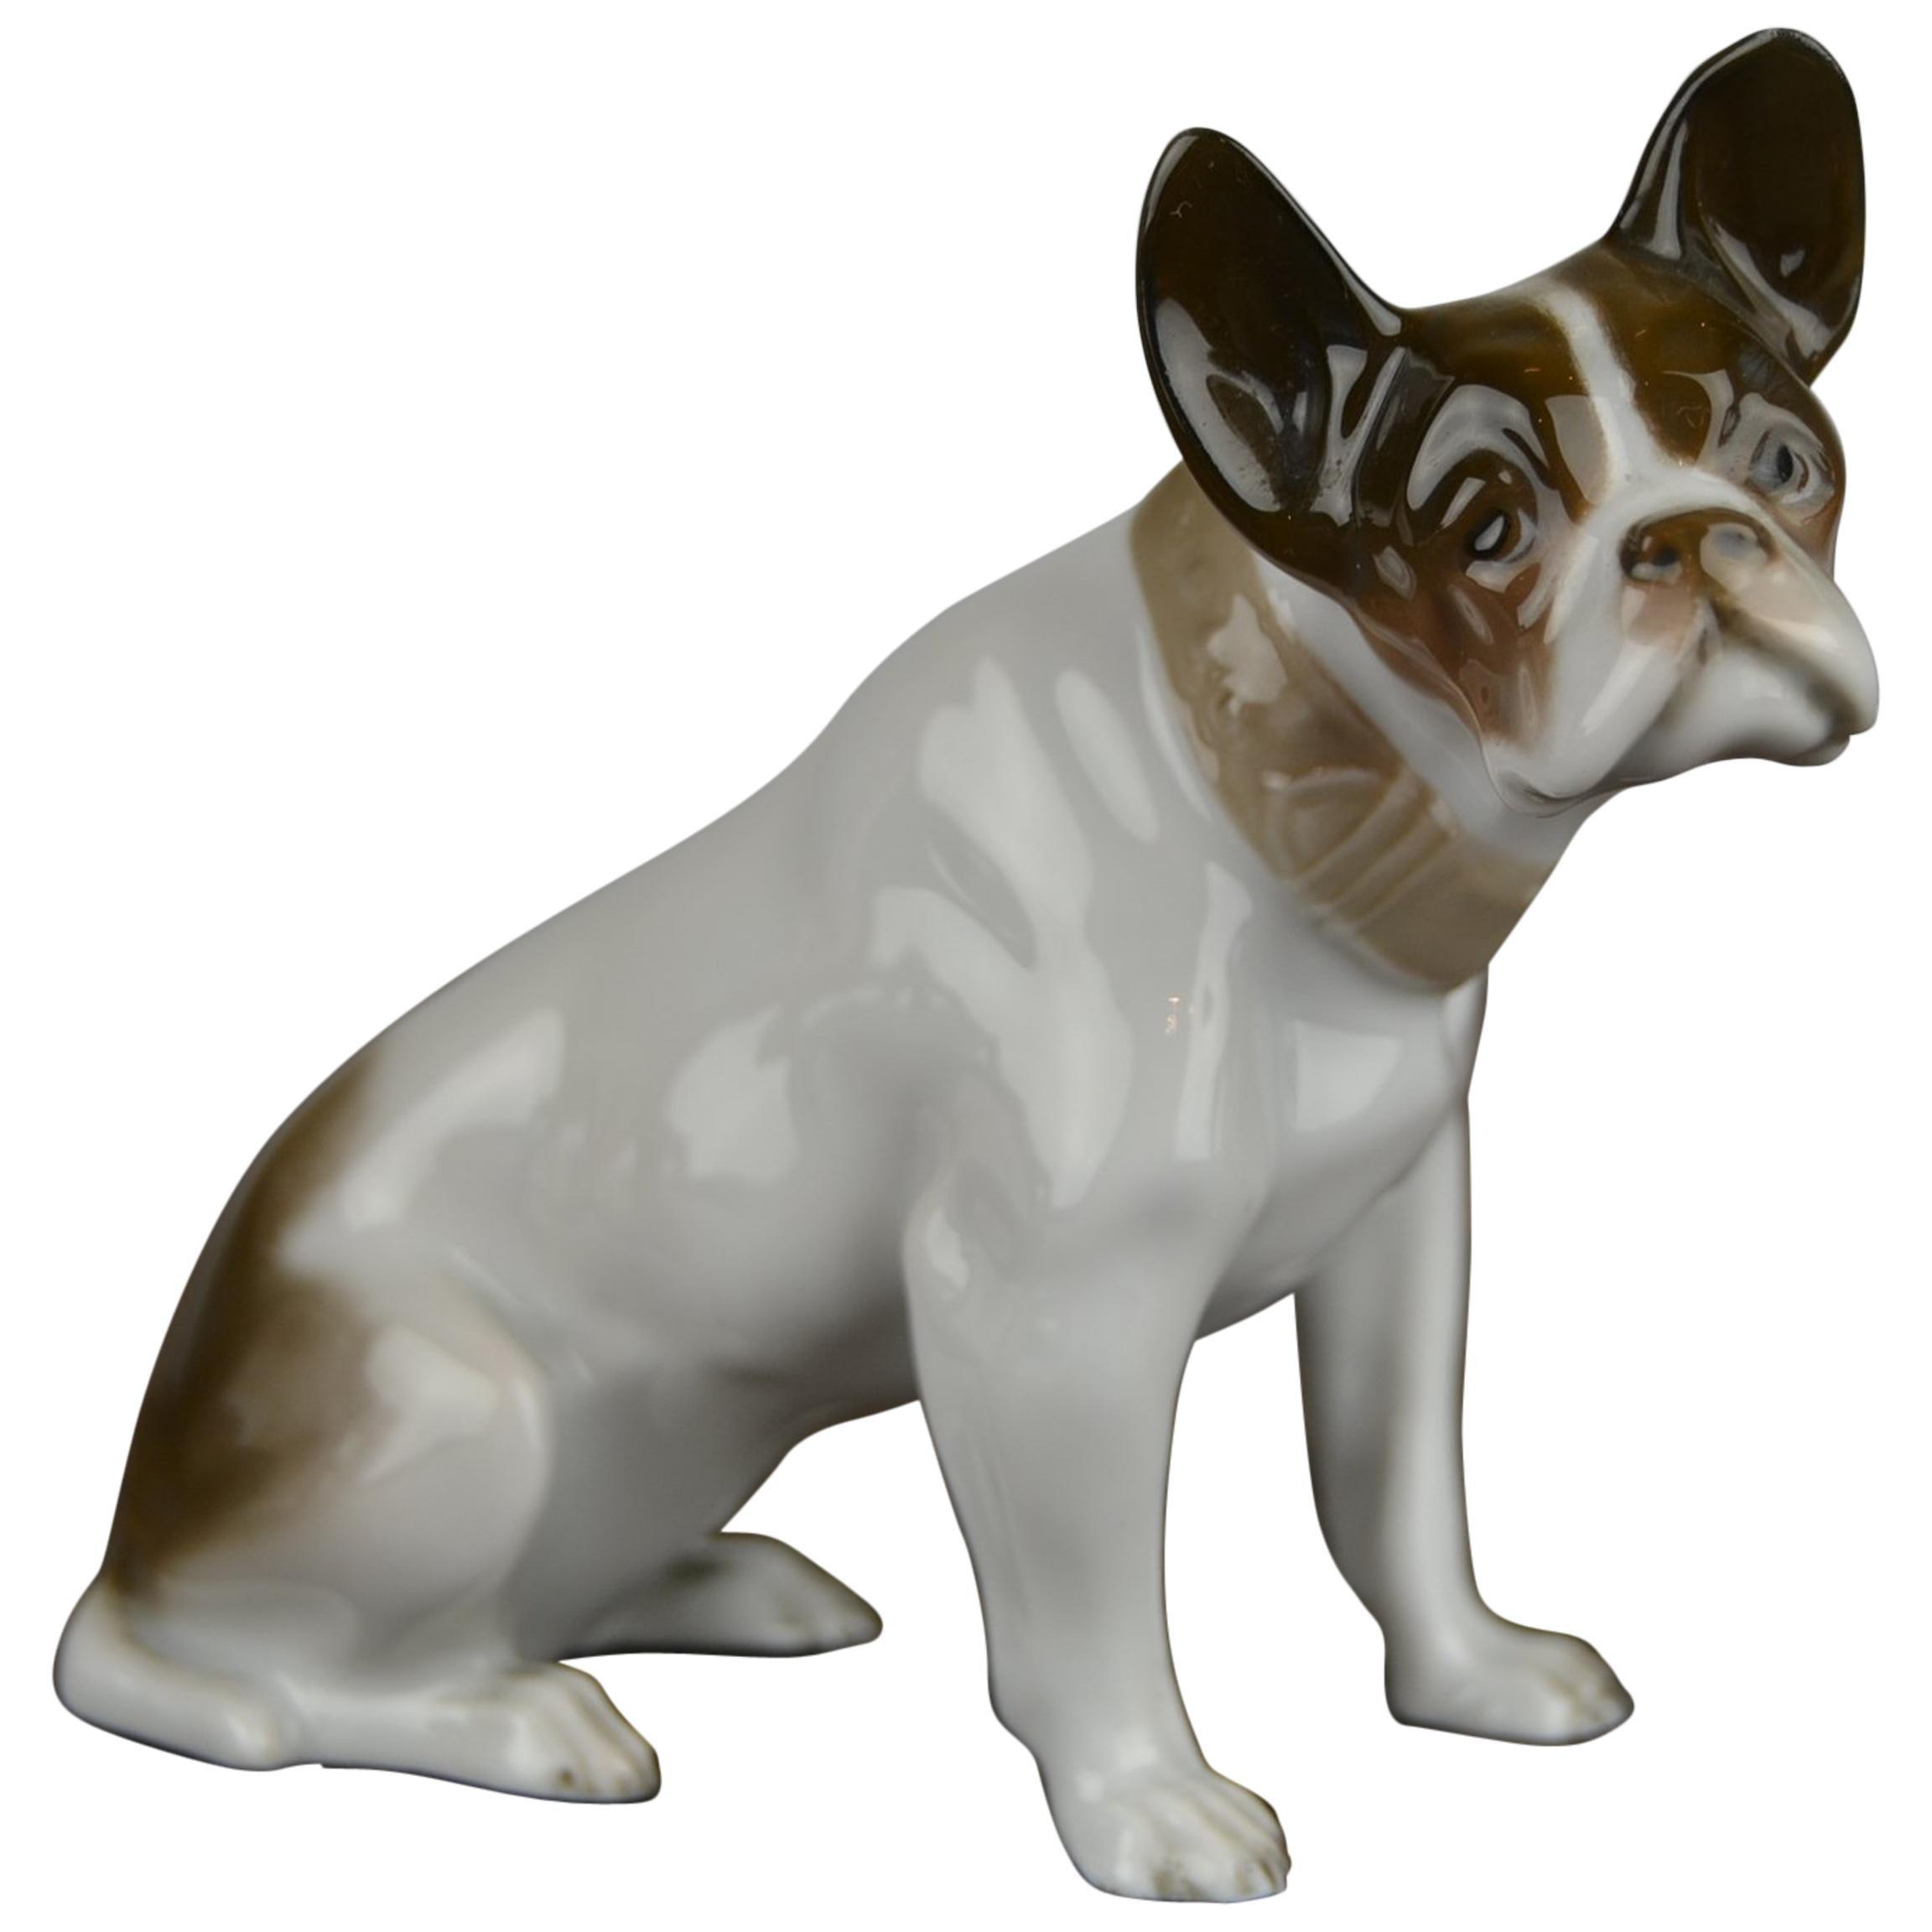 1920s French Bulldog Figurine Rosenthal Selb Bavaria Germany, Art Deco Porcelain